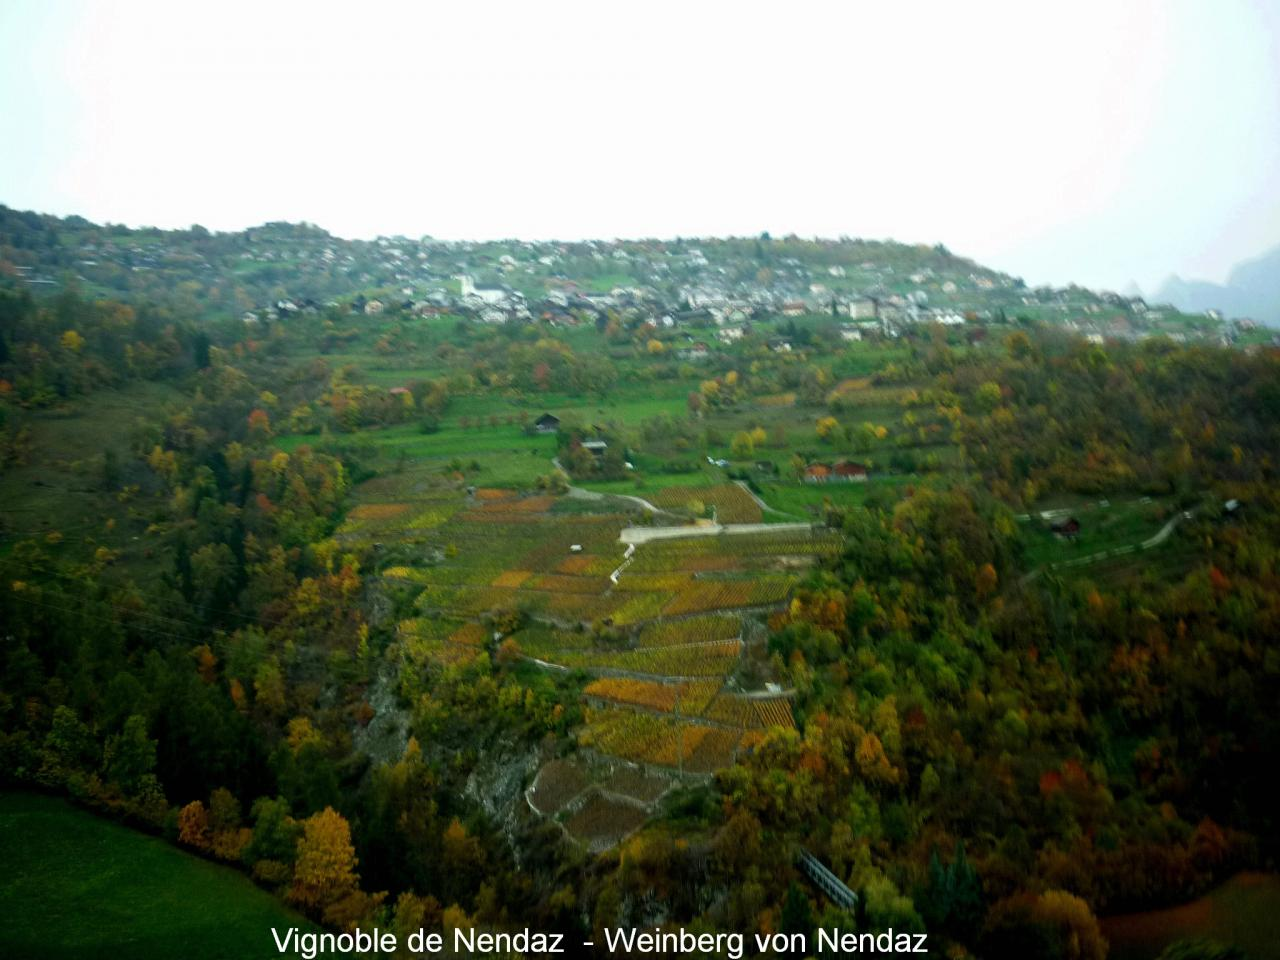 Vignoble de Nendaz